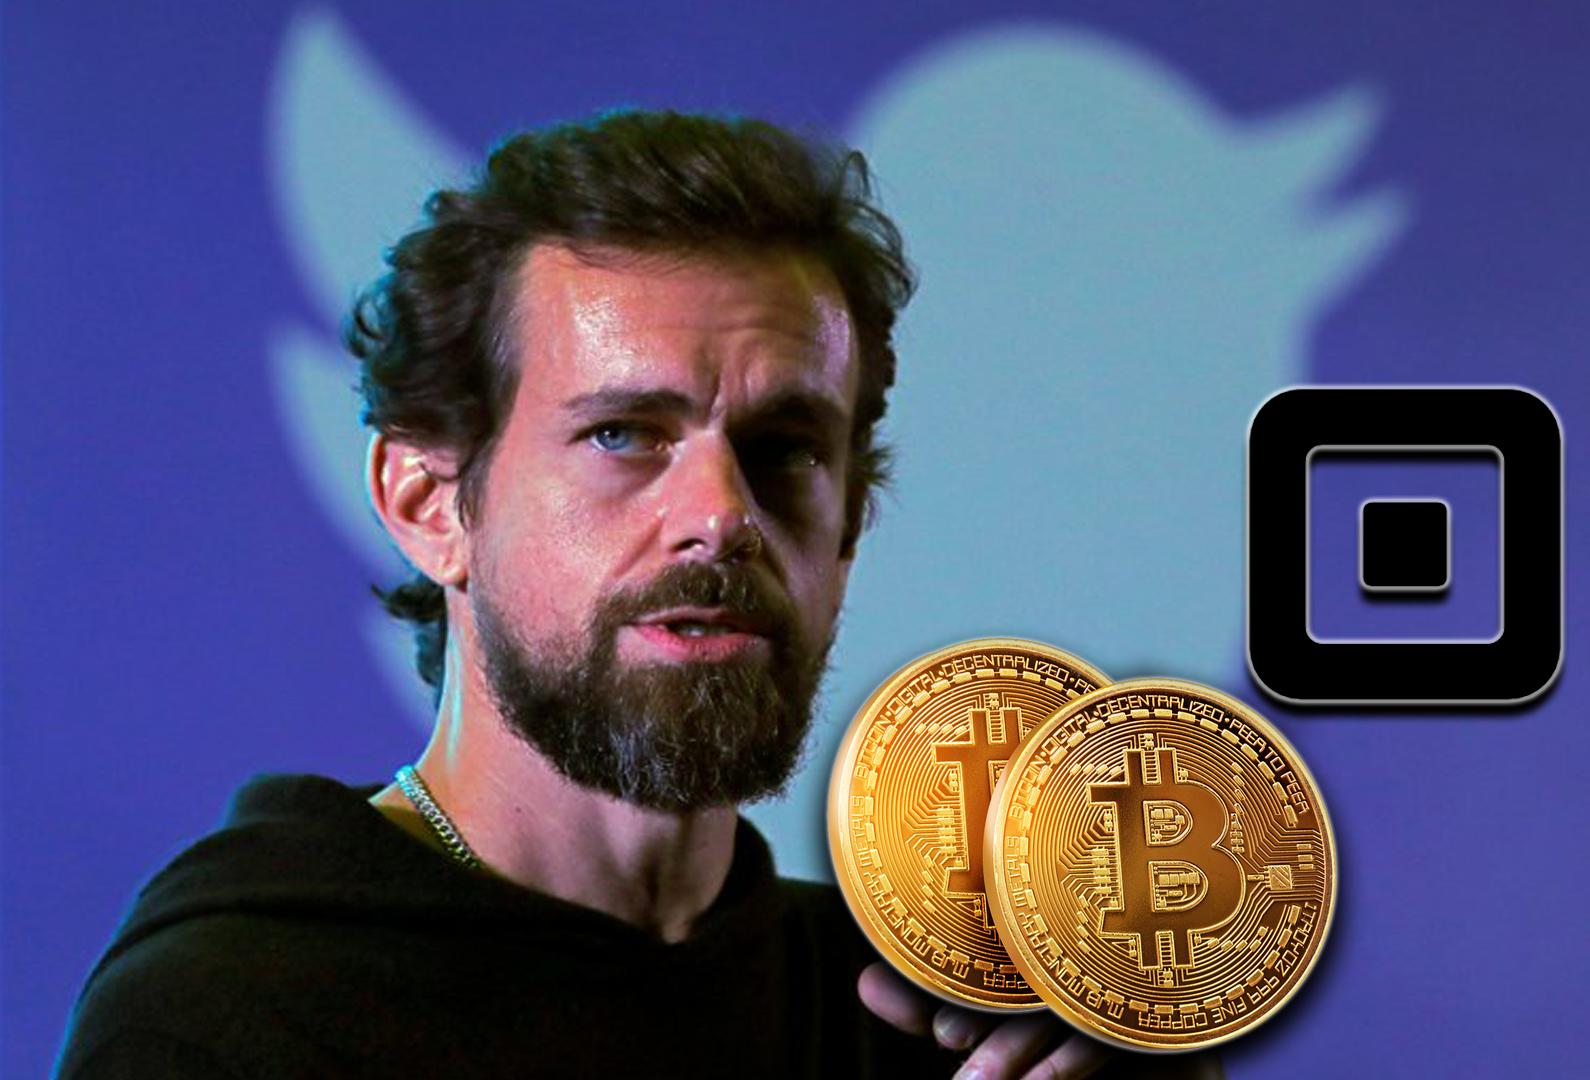 jack bitcoin)